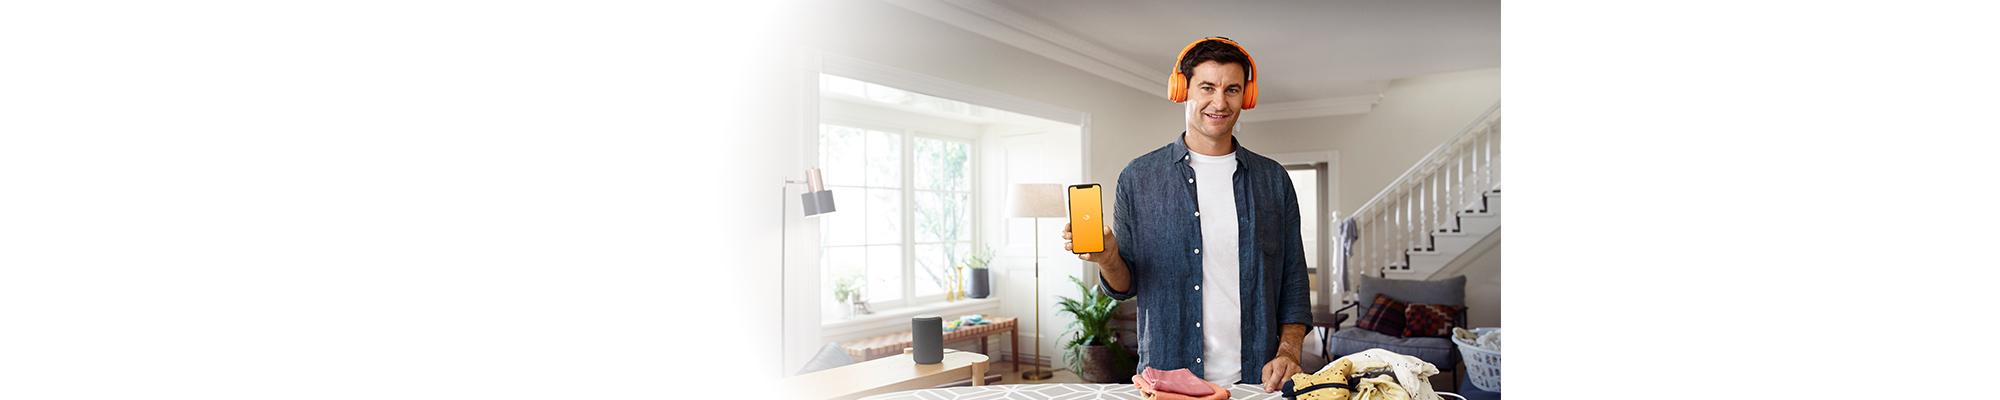 Clark Gayford holding up his Audible app, playing an audiobook